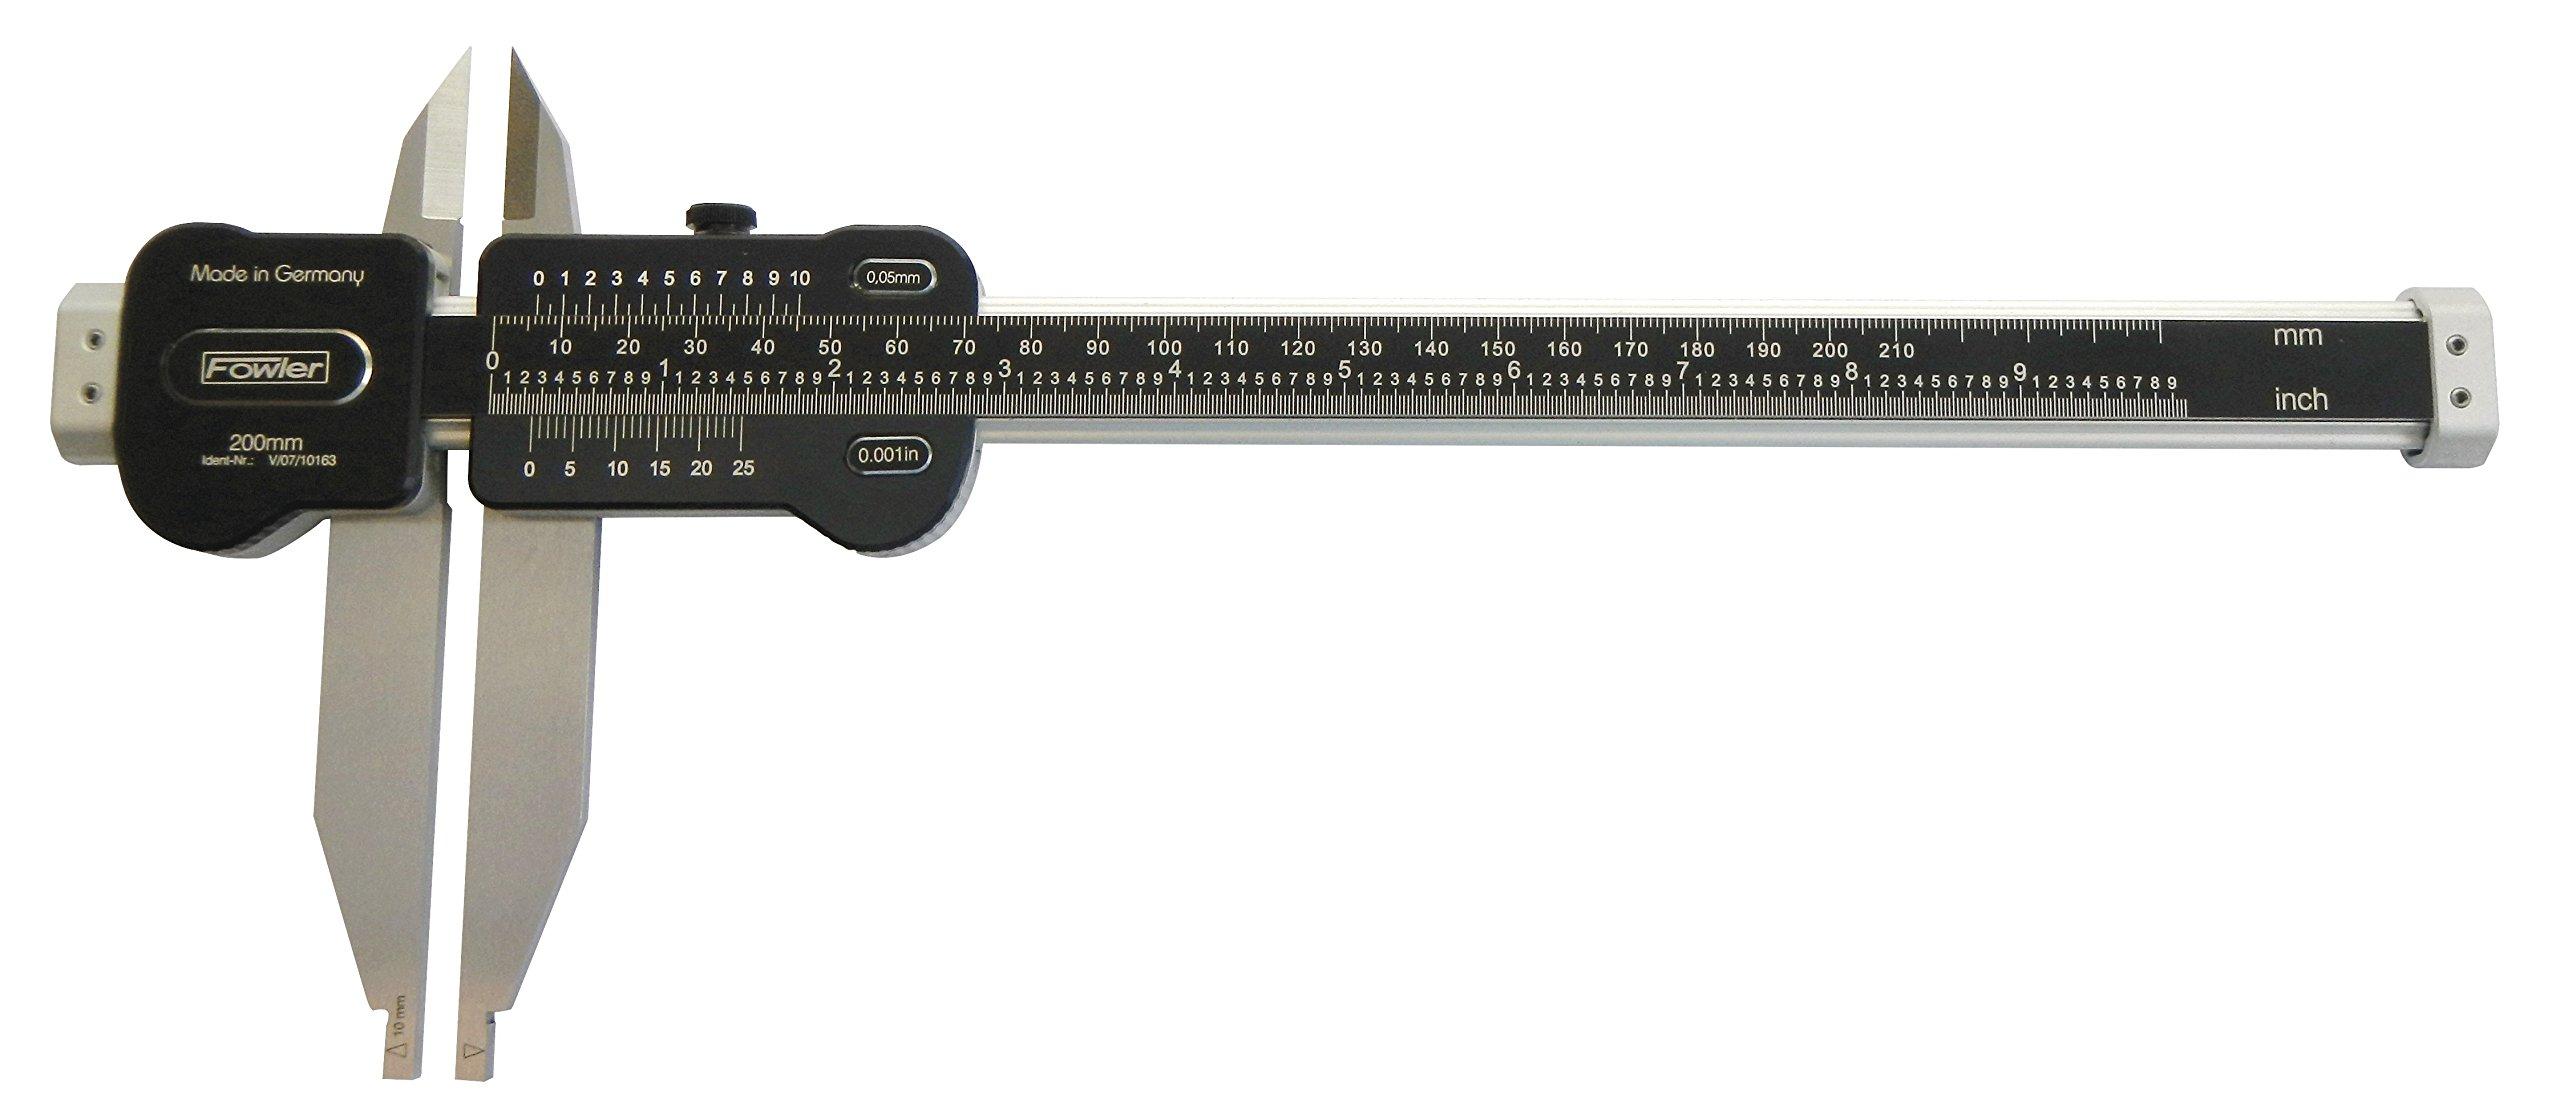 Fowler 52-075-035-0 35''/900mm Light Line Vernier Caliper, Range: 0-35''/900mm, 0.0015''/0.04mm Accuracy, 0.001''/0.05mm, Aluminum, black